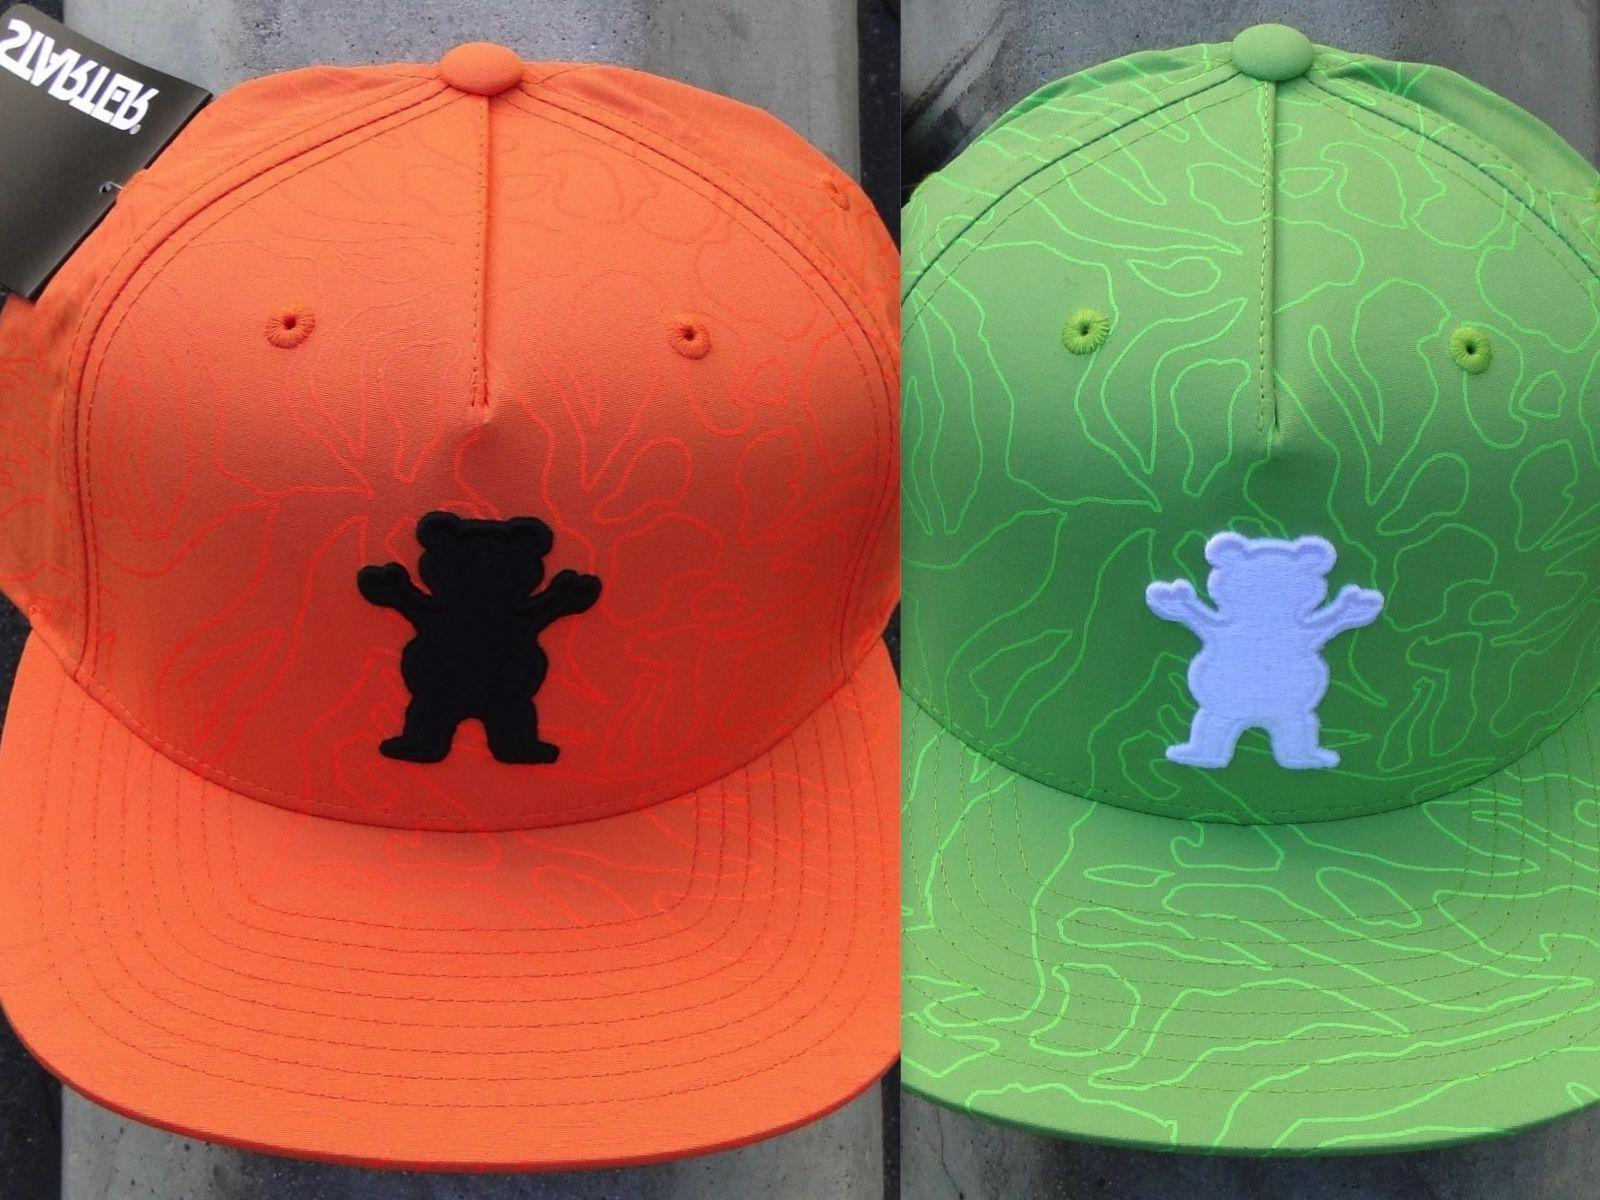 New Grizzly Griptape Skate Co. Topography OG Bear Mens Snapb